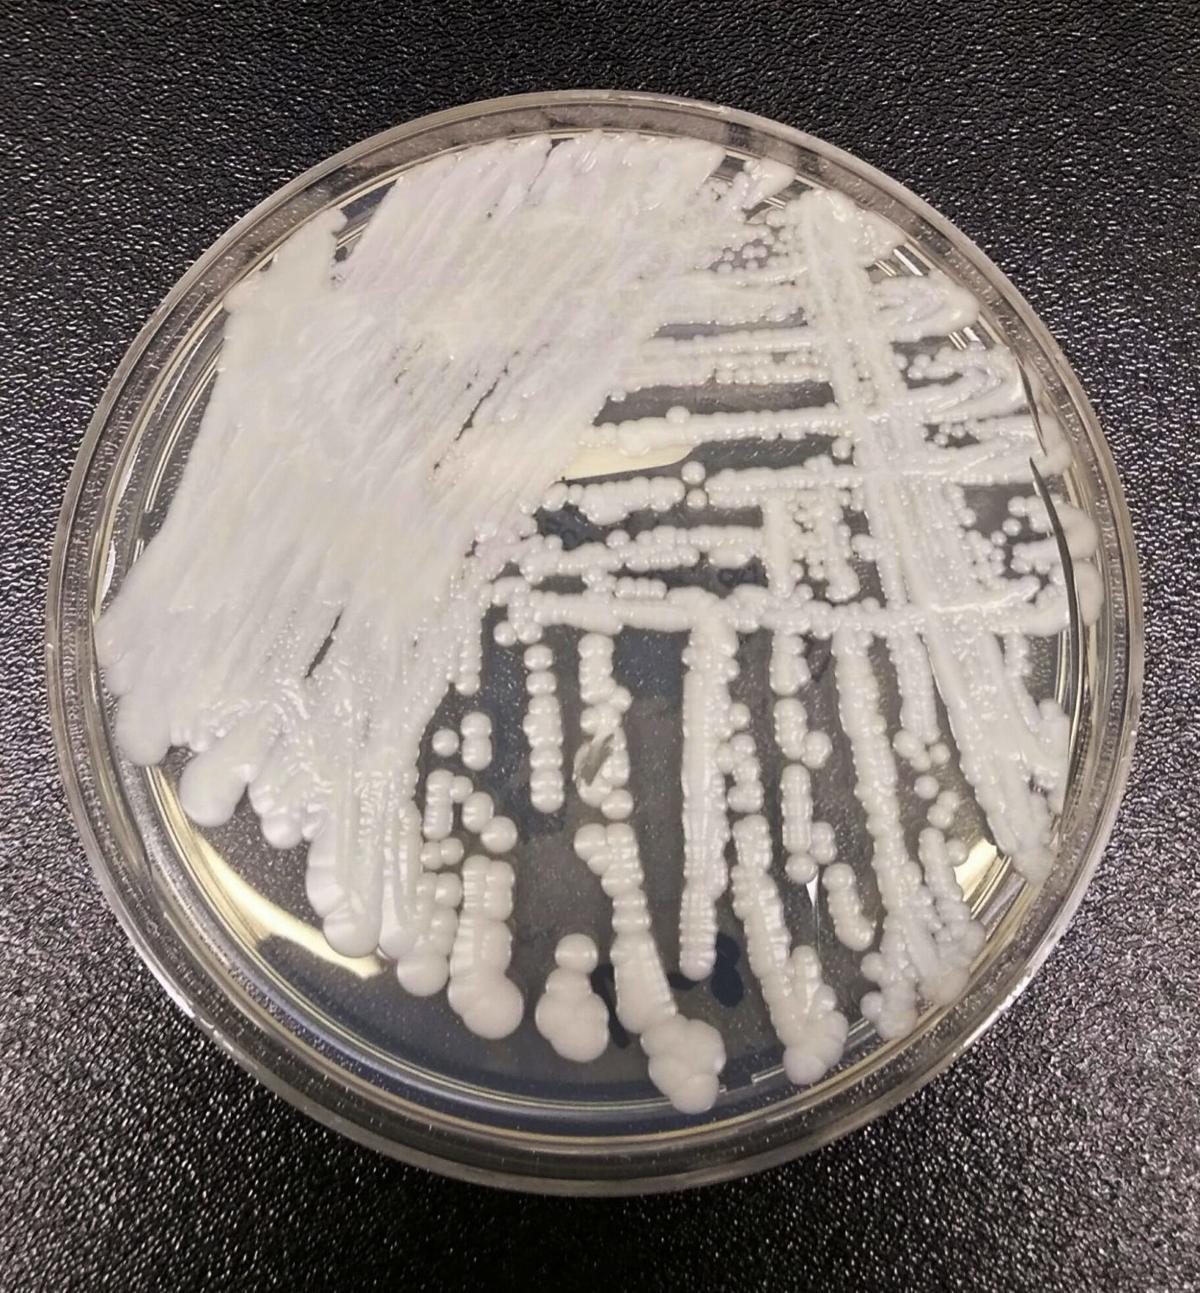 Superbug Fungus